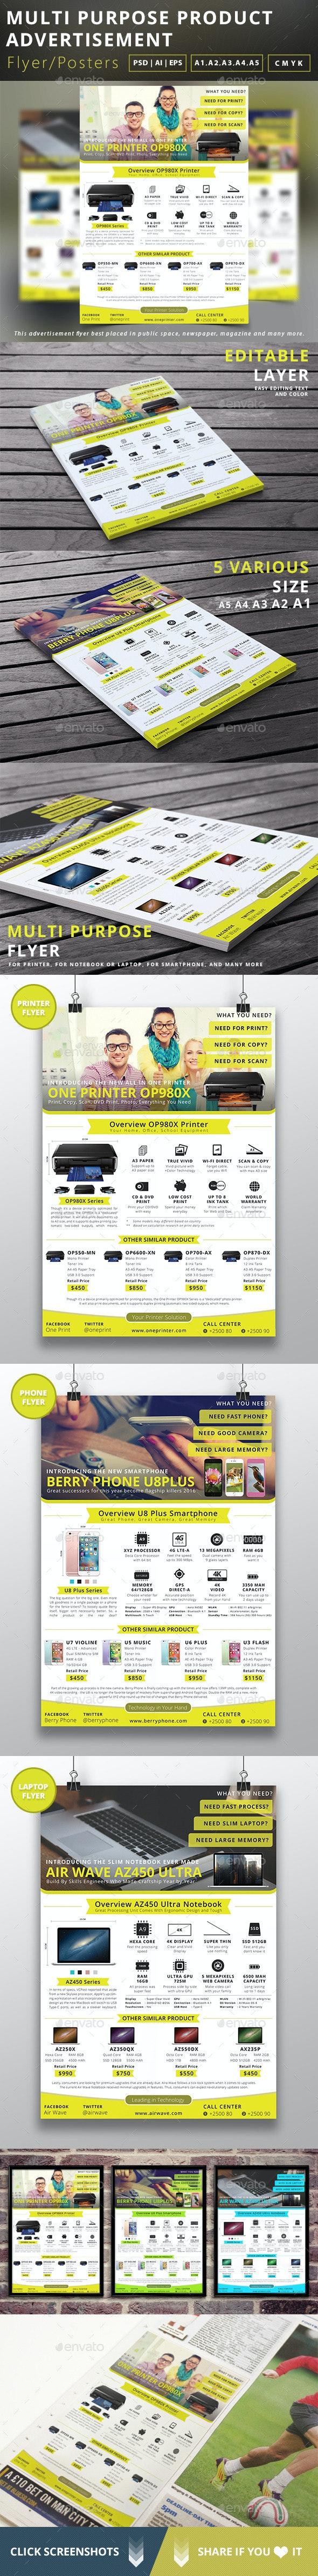 Multipurpose Product Advertisement Flyer - Commerce Flyers